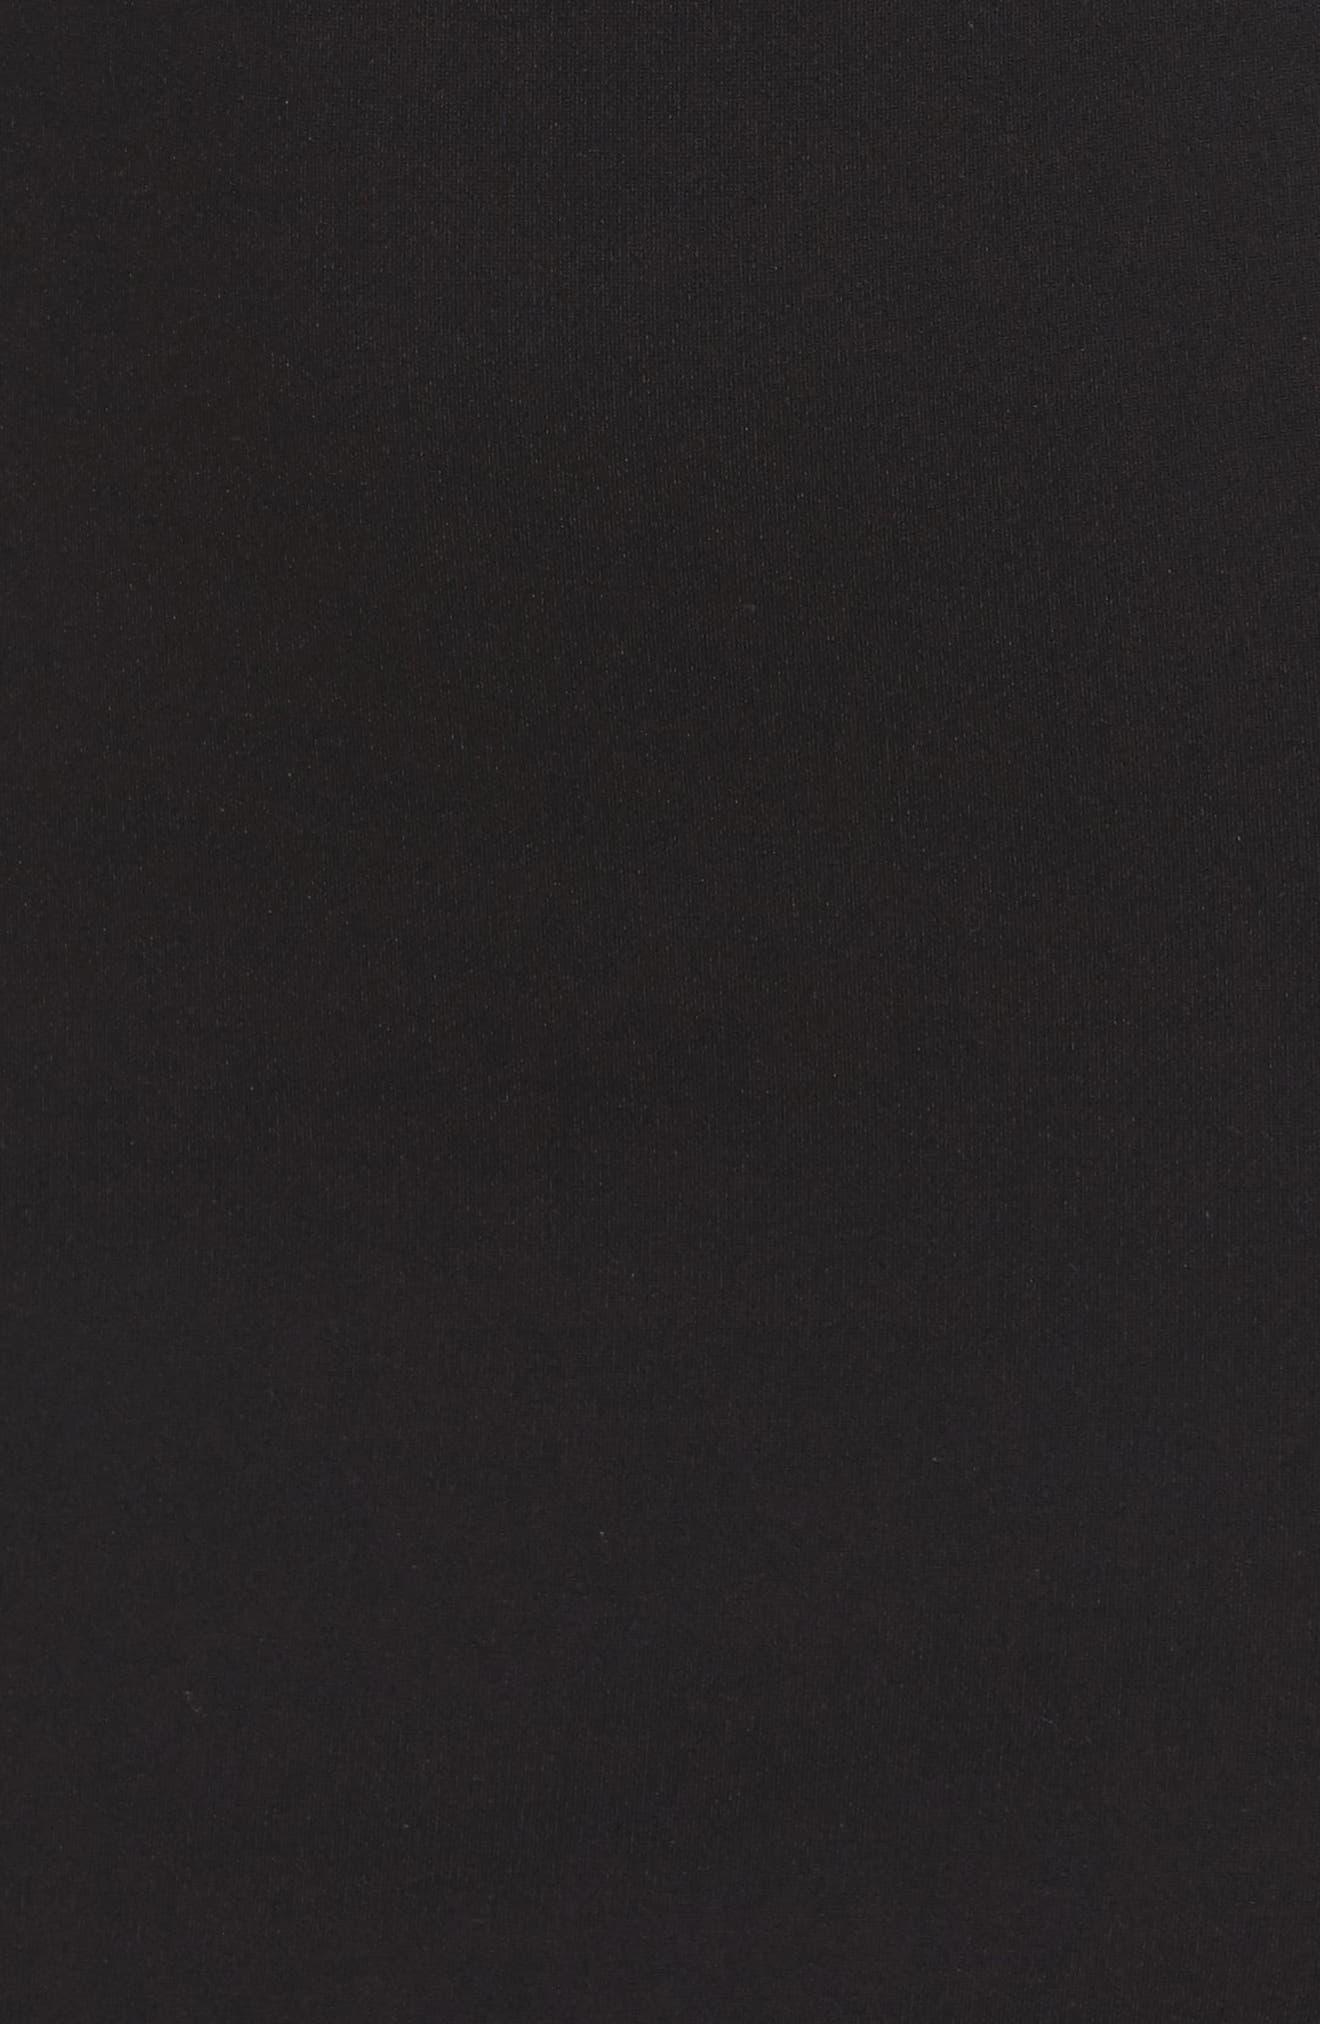 Milly Bell Sleeve Midi Dress,                             Alternate thumbnail 6, color,                             Black